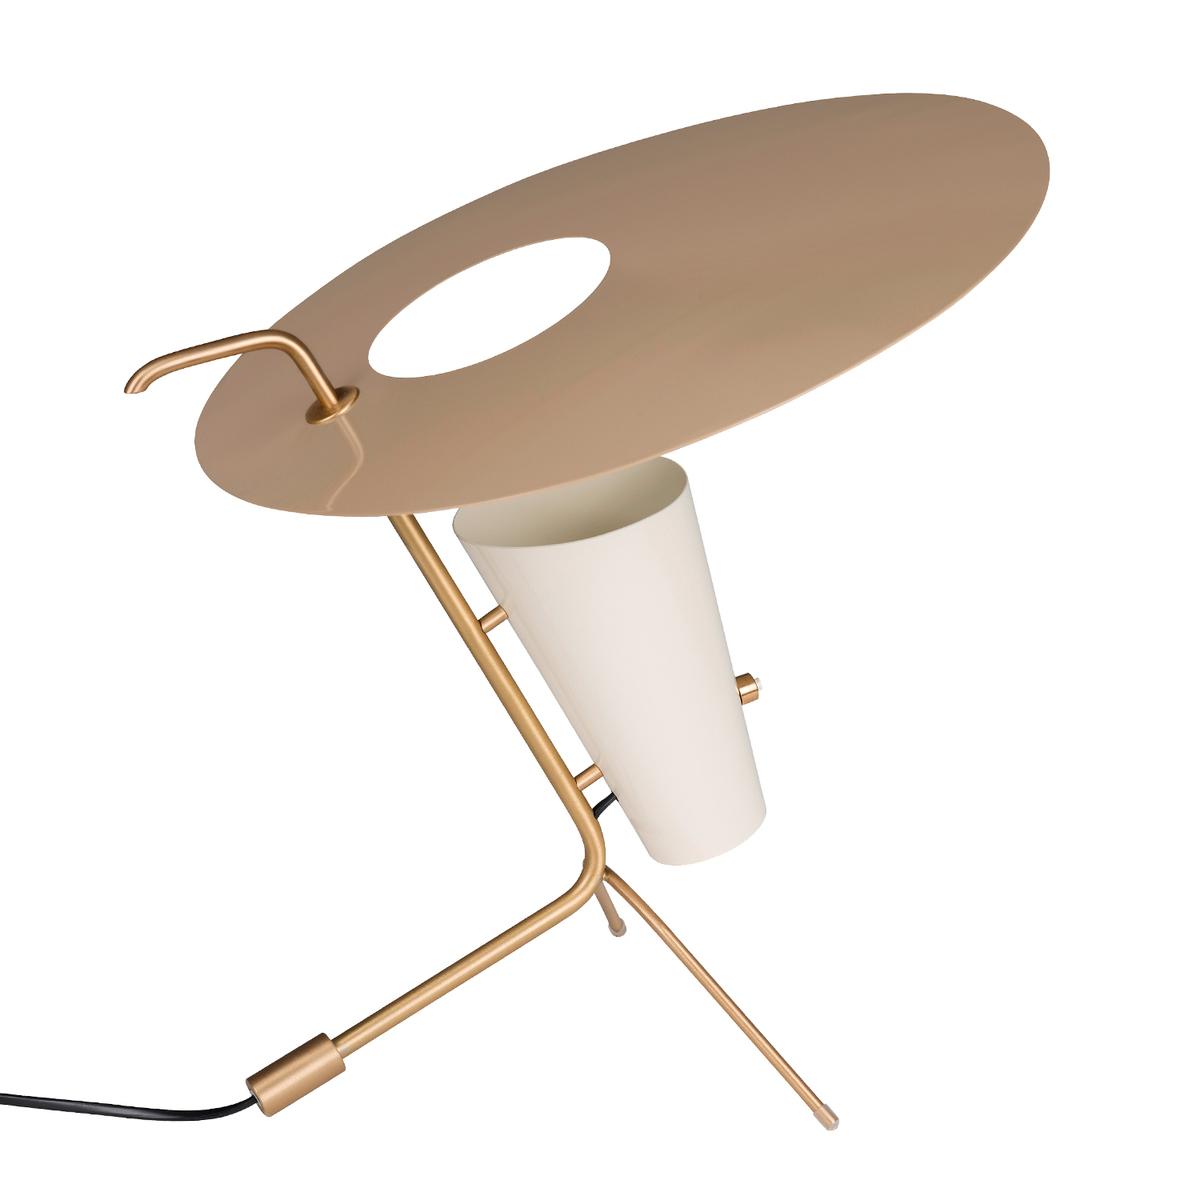 Sammode G24 Table Lamp, Sand